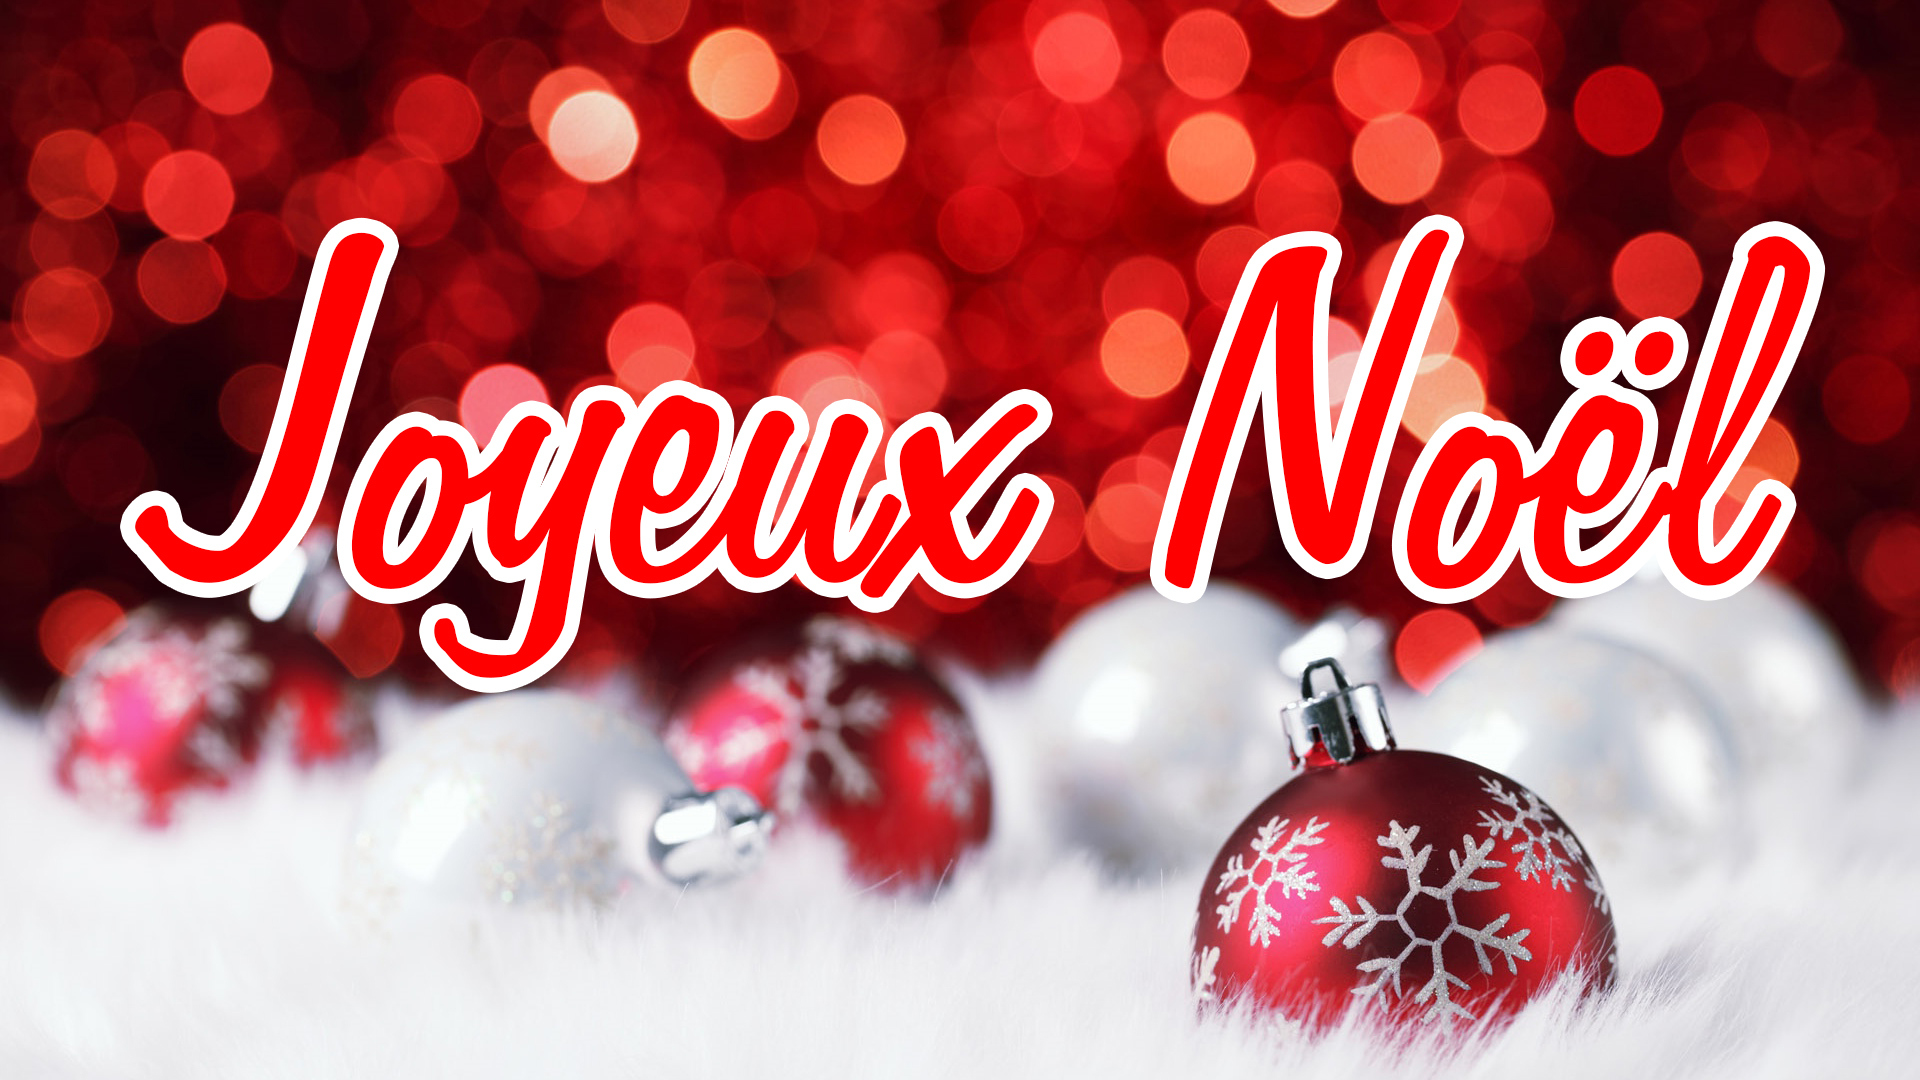 Fonds D Ecran Joyeux Noel Maximumwallhd